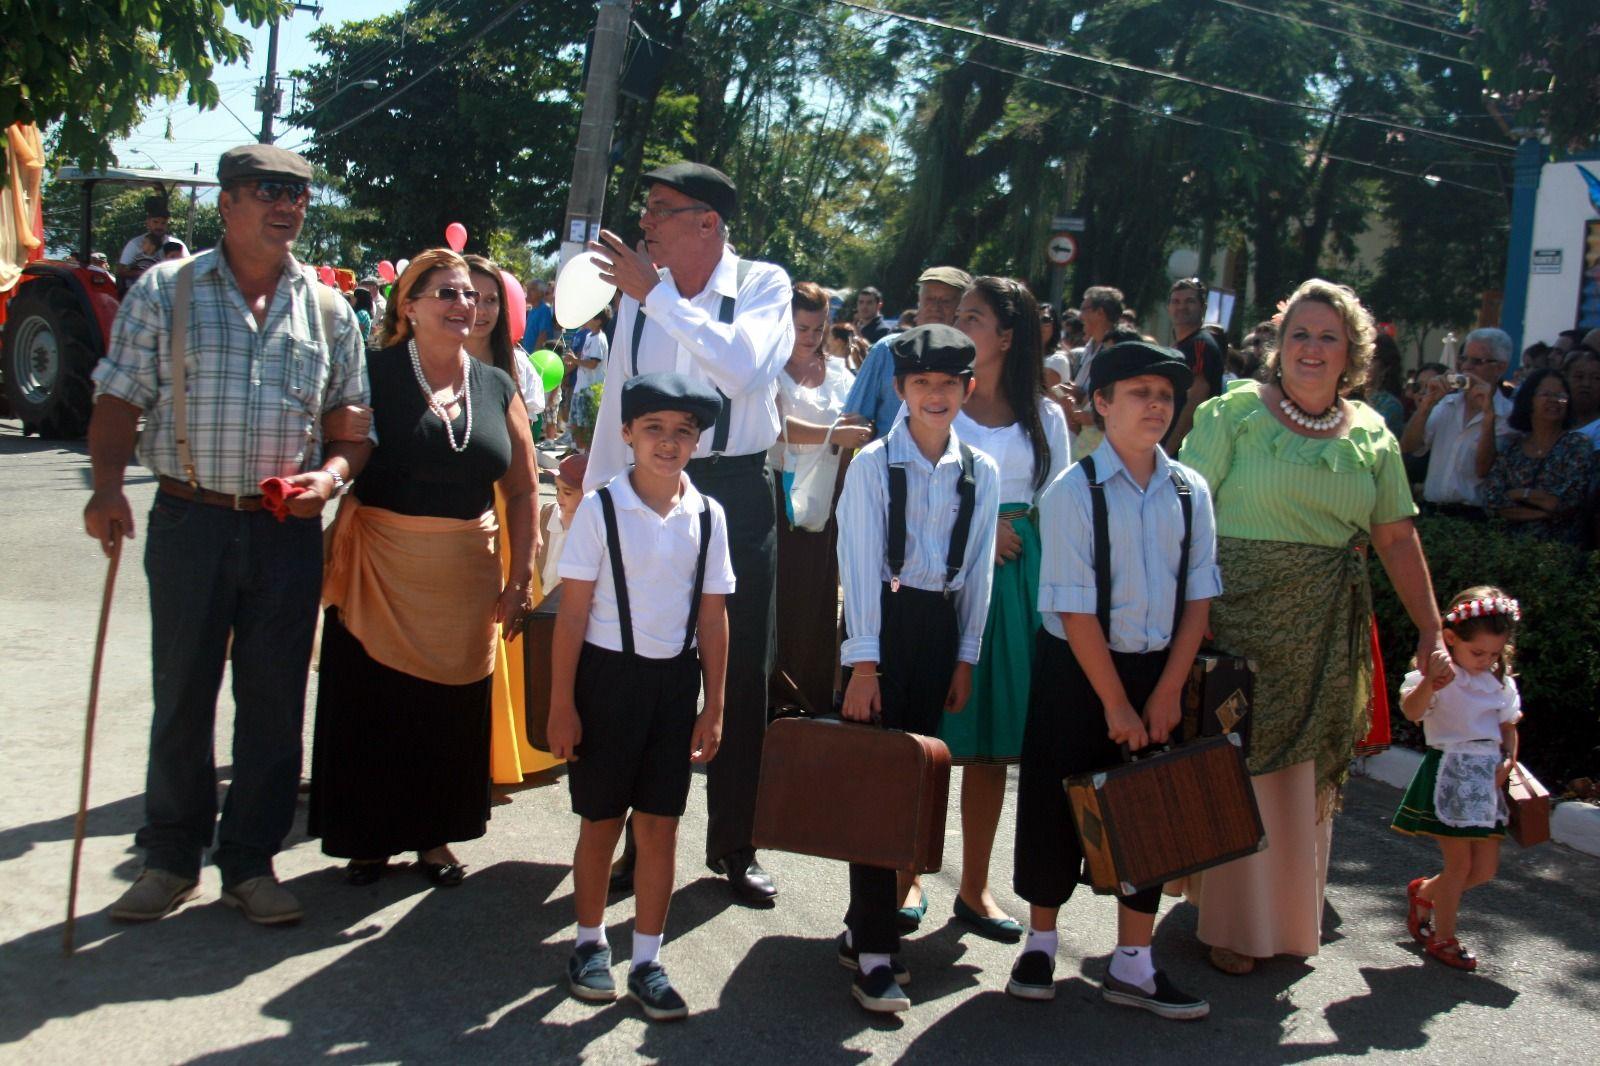 A 28ª Festa Italiana, que acontece de 26 de abril a 1º de maio nas ruas do Distrito. / Prefeitura de Taubat¿¿